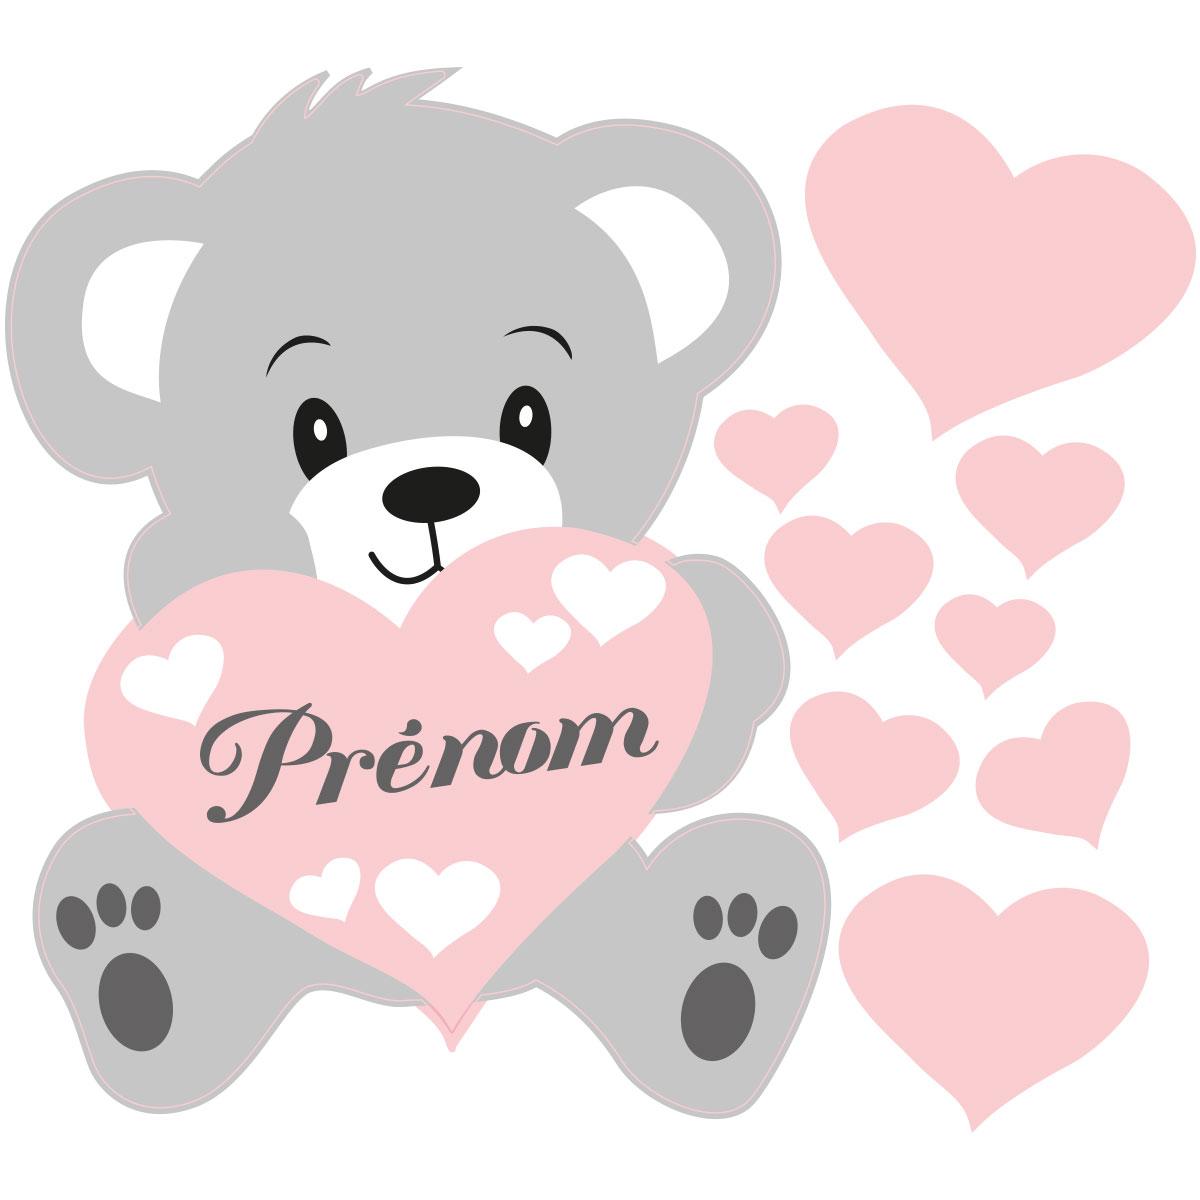 Sticker prénom personnalisable ourson rose – Stickers